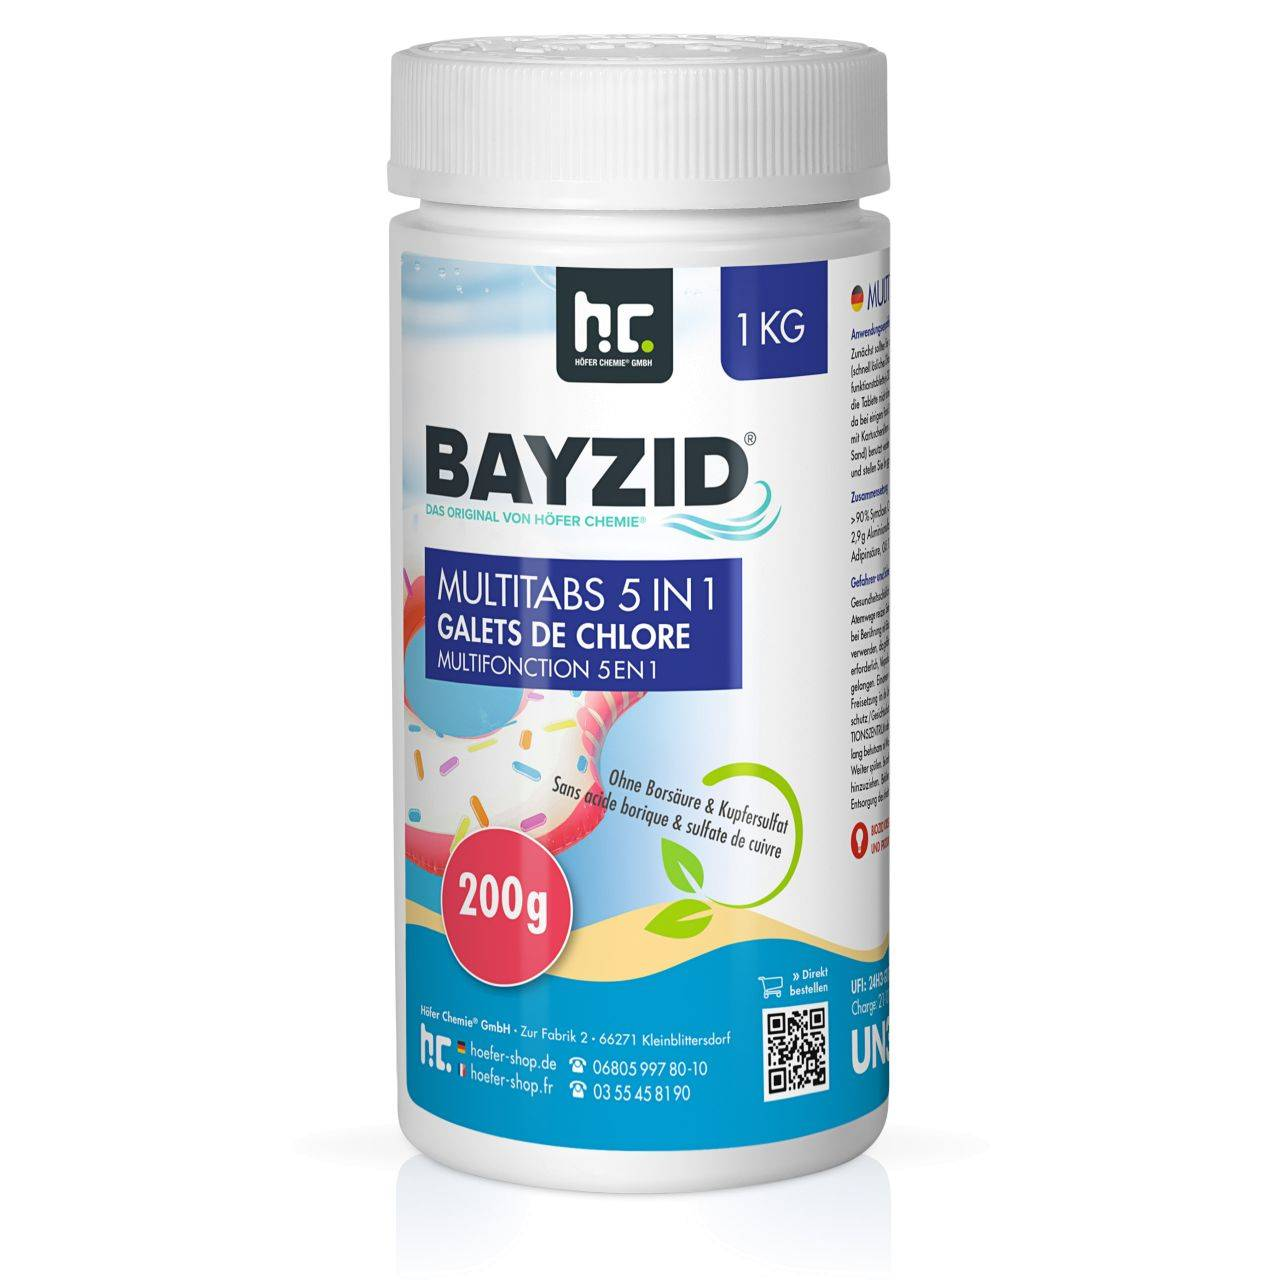 BAYZID 6 kg Galets de chlore multifonction (200g) (6 x 1 kg)